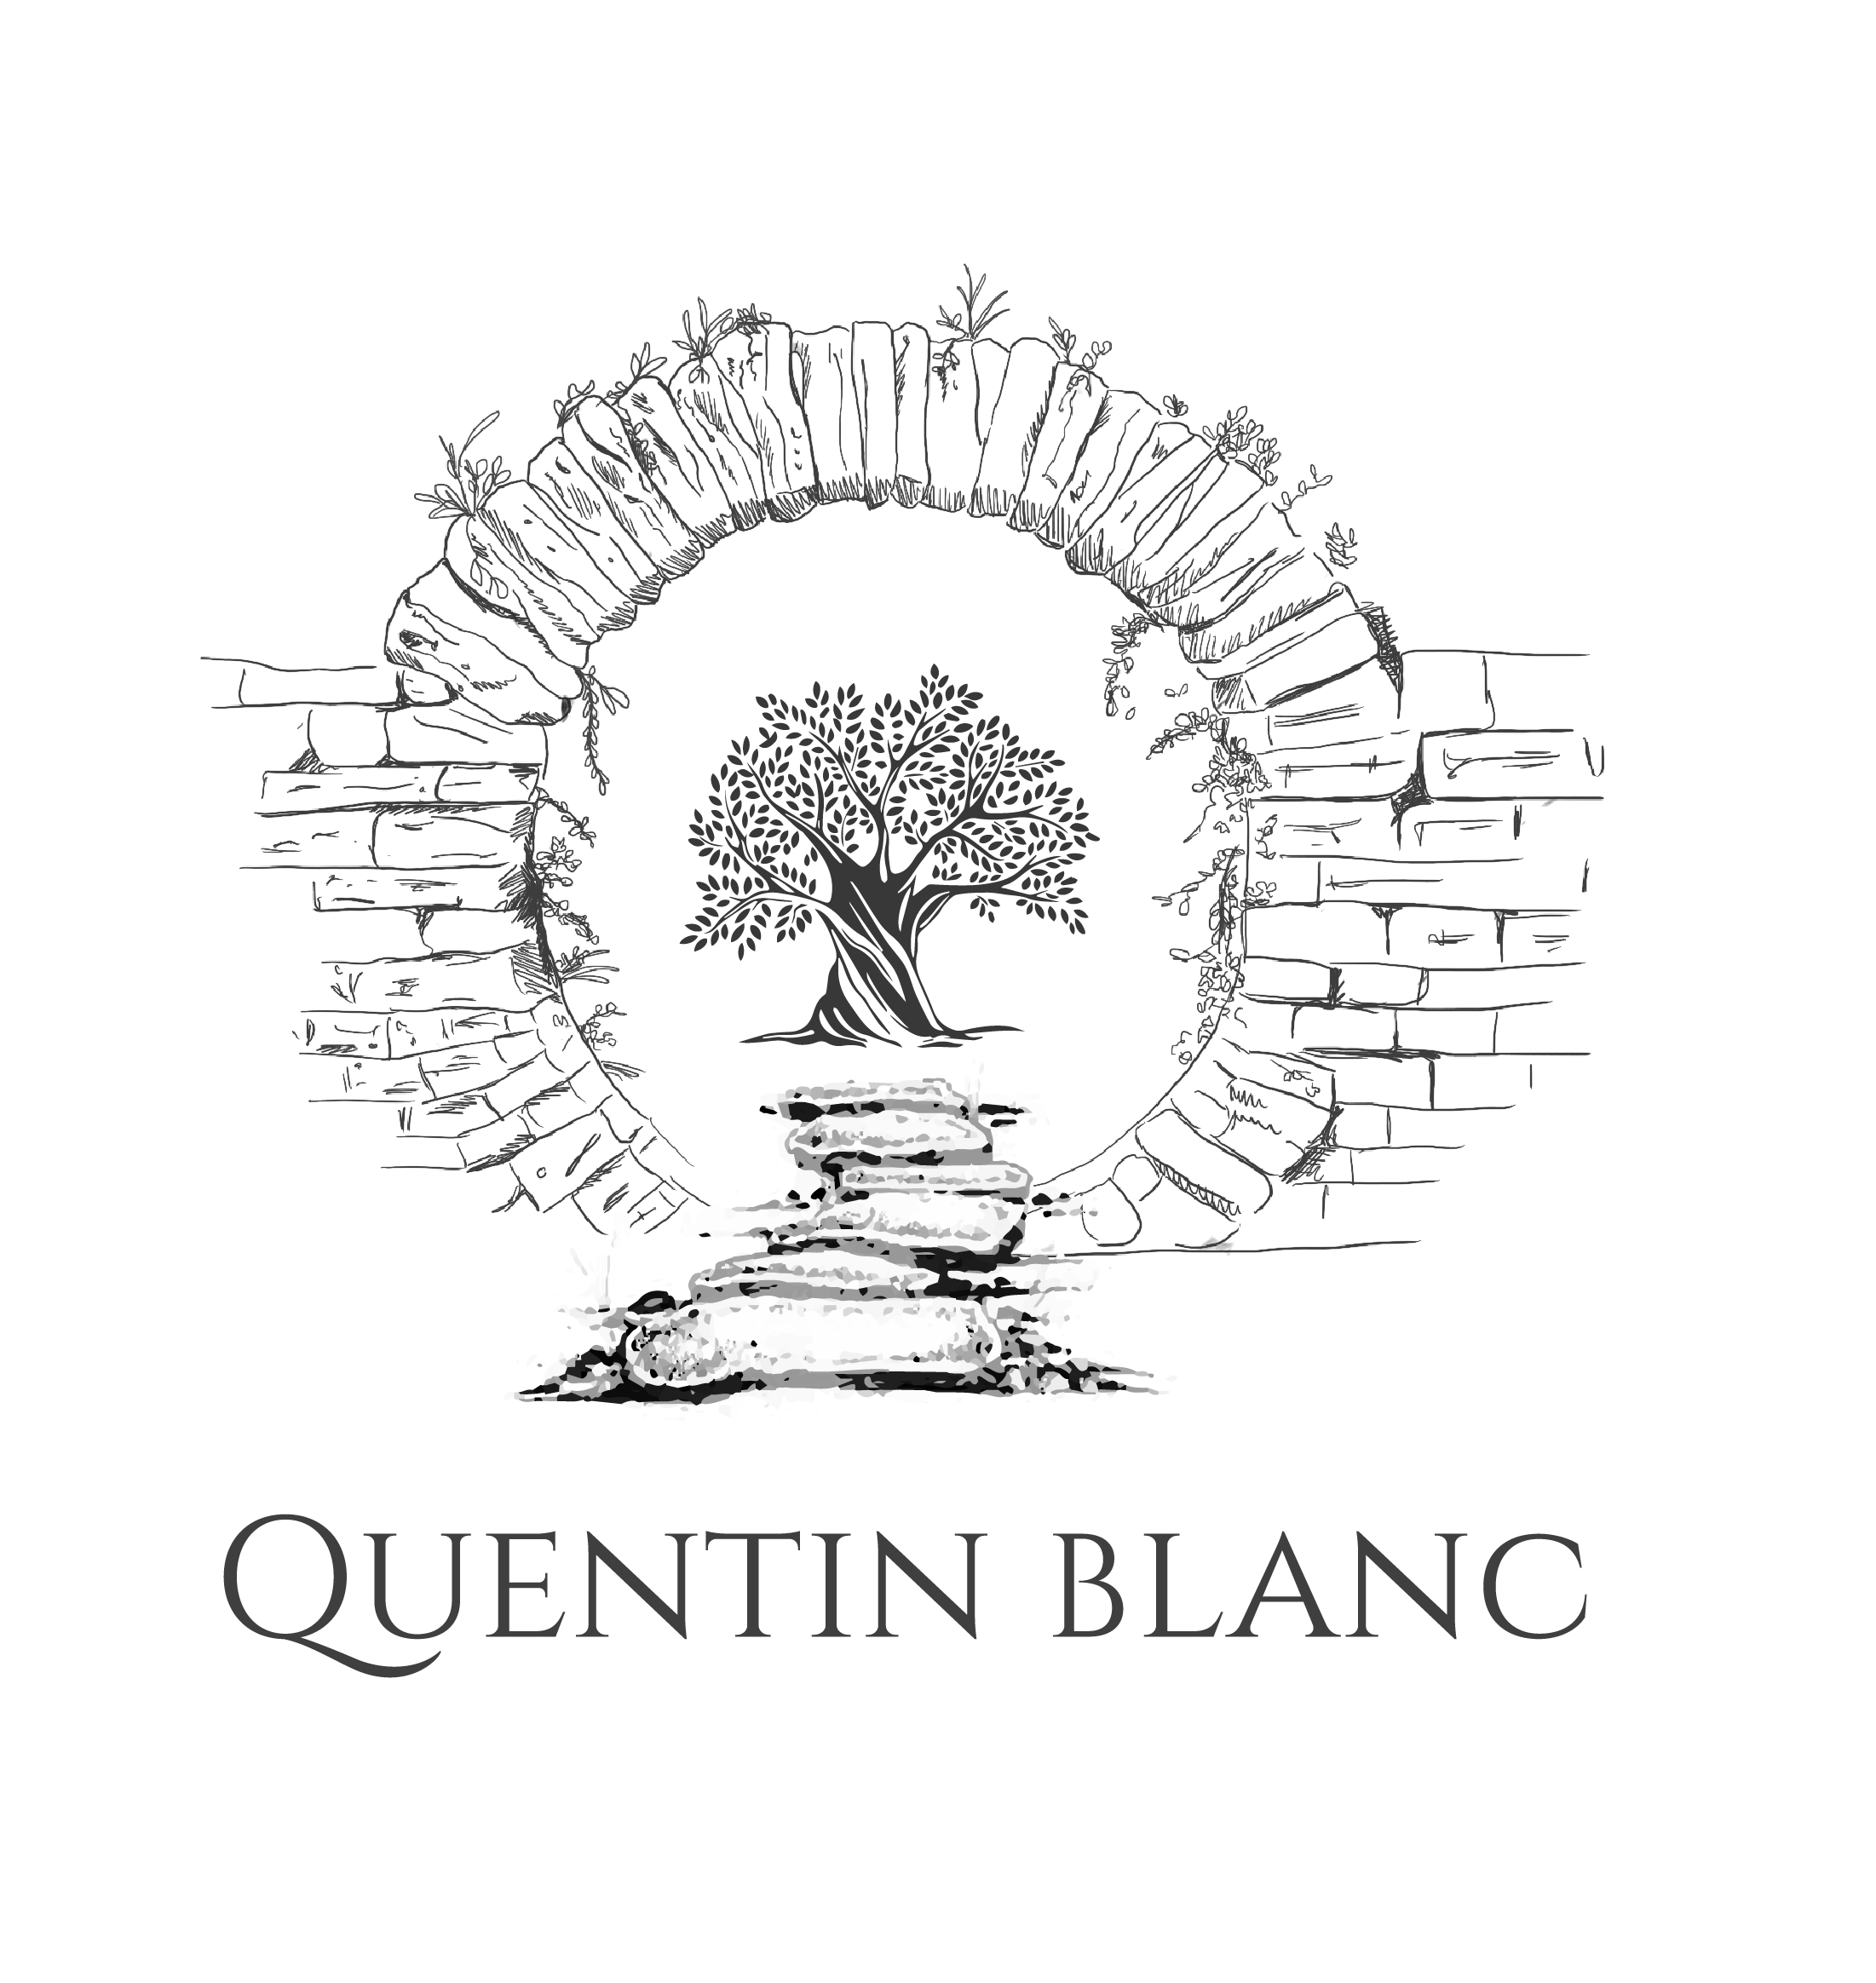 Quentin Blanc